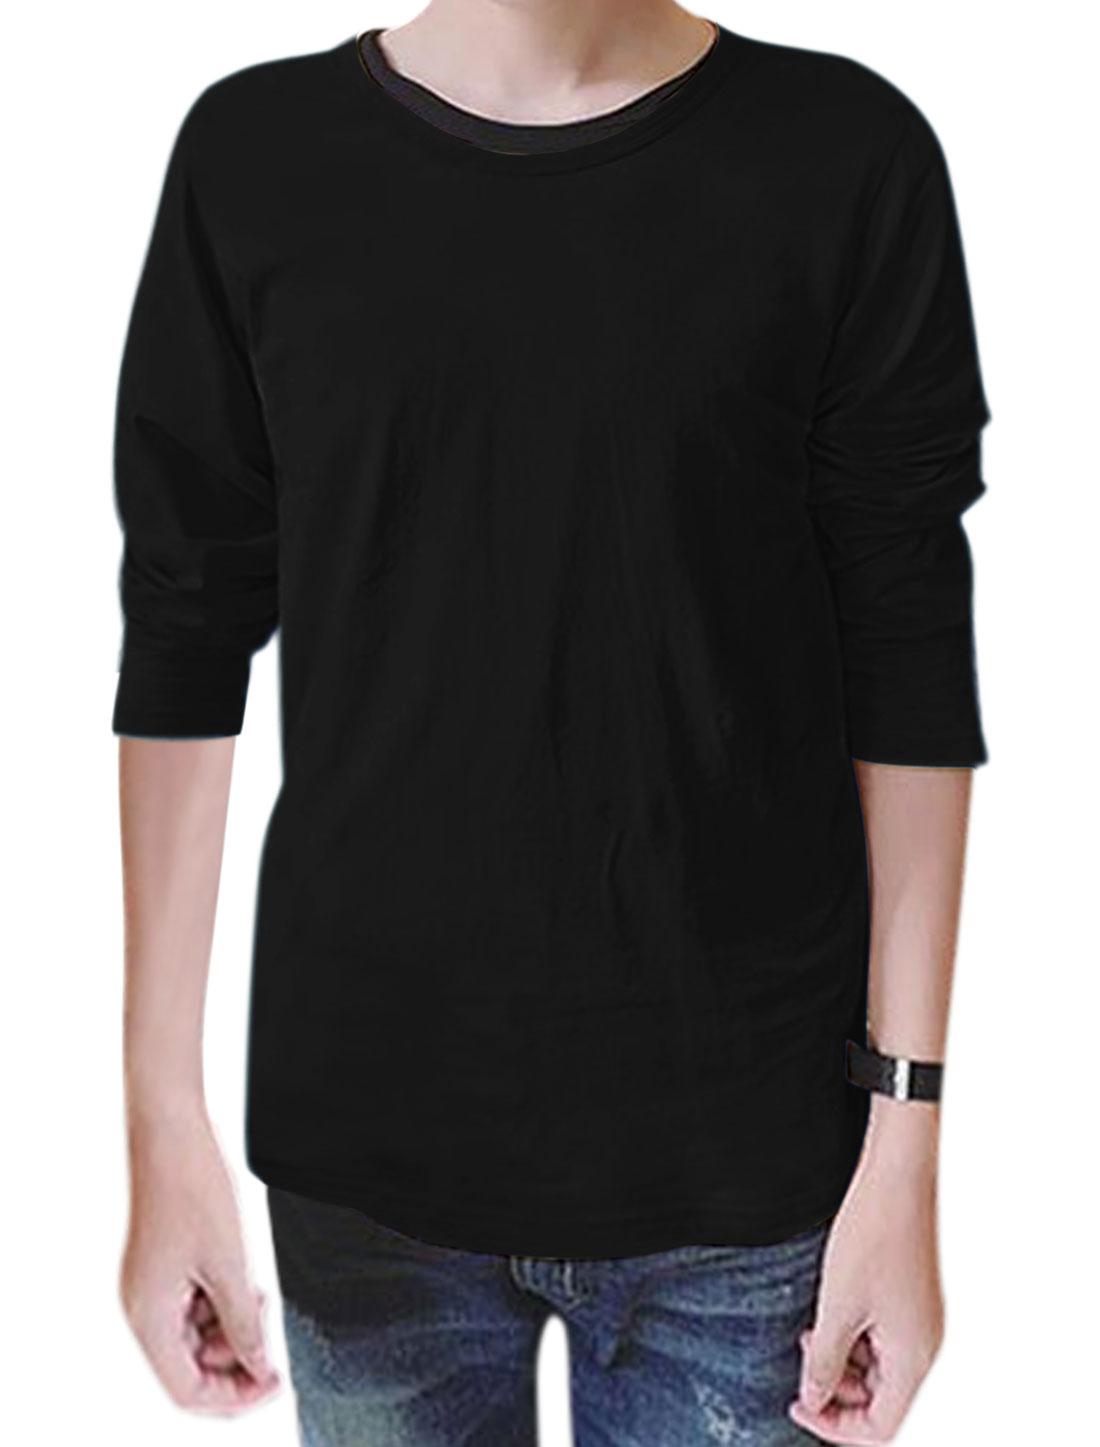 Men Round Neck Long Sleeves Slim Fit T-Shirt Black M